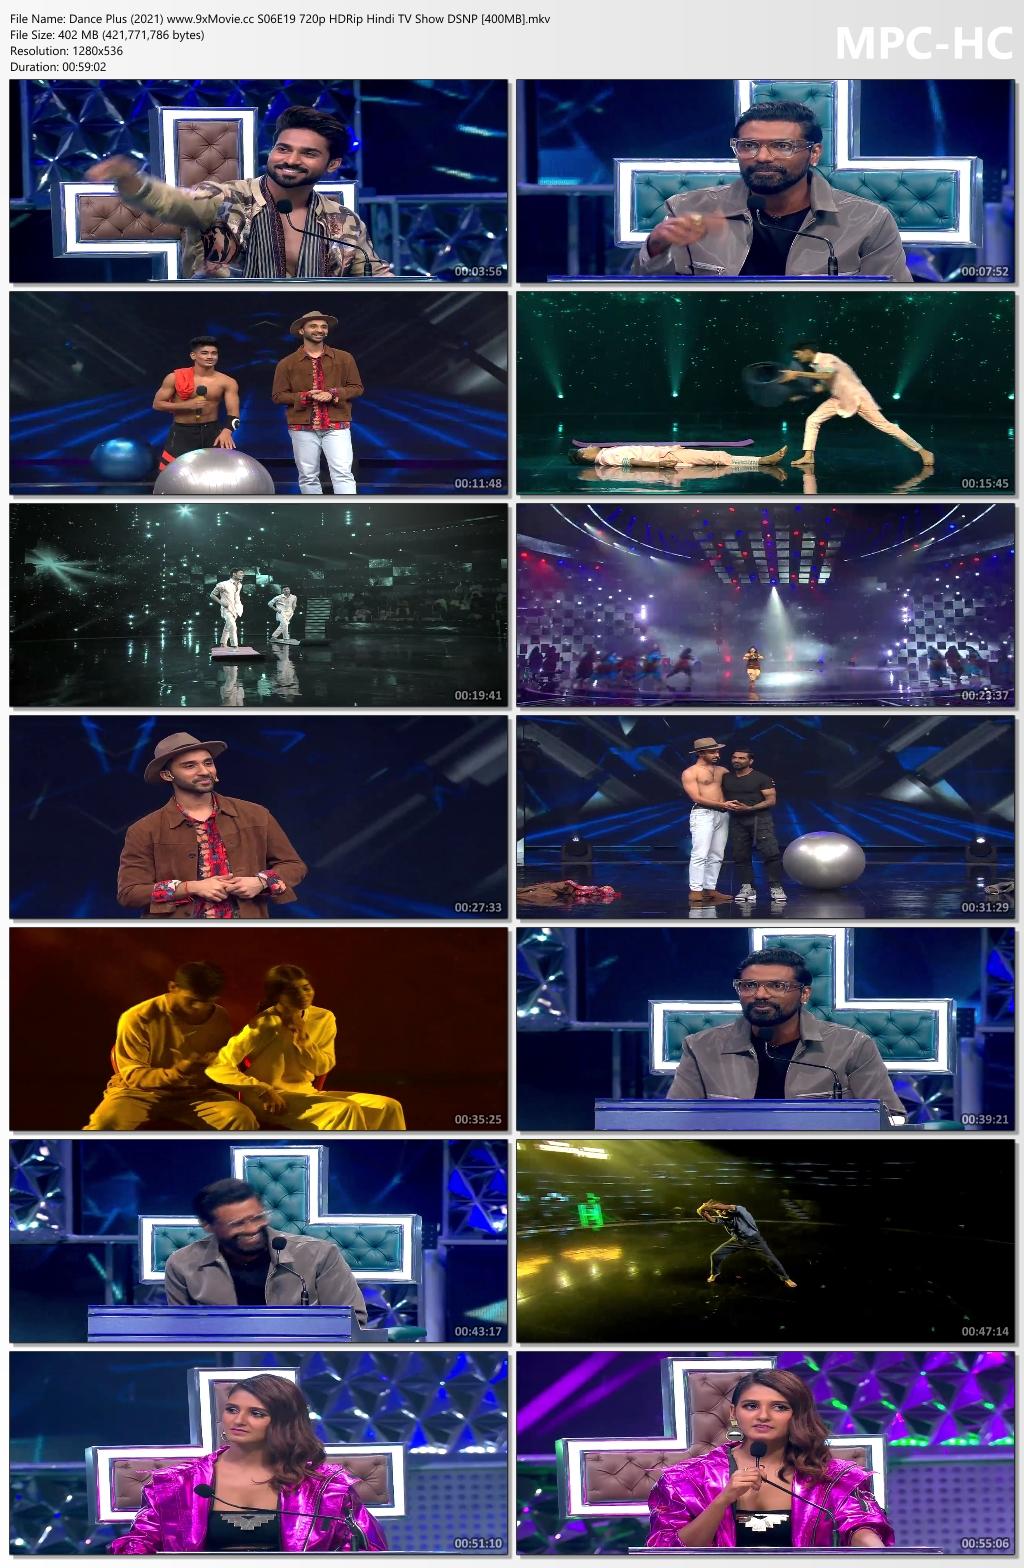 Dance-Plus-2021-www-9x-Movie-cc-S06-E19-720p-HDRip-Hindi-TV-Show-DSNP-400-MB-mkv